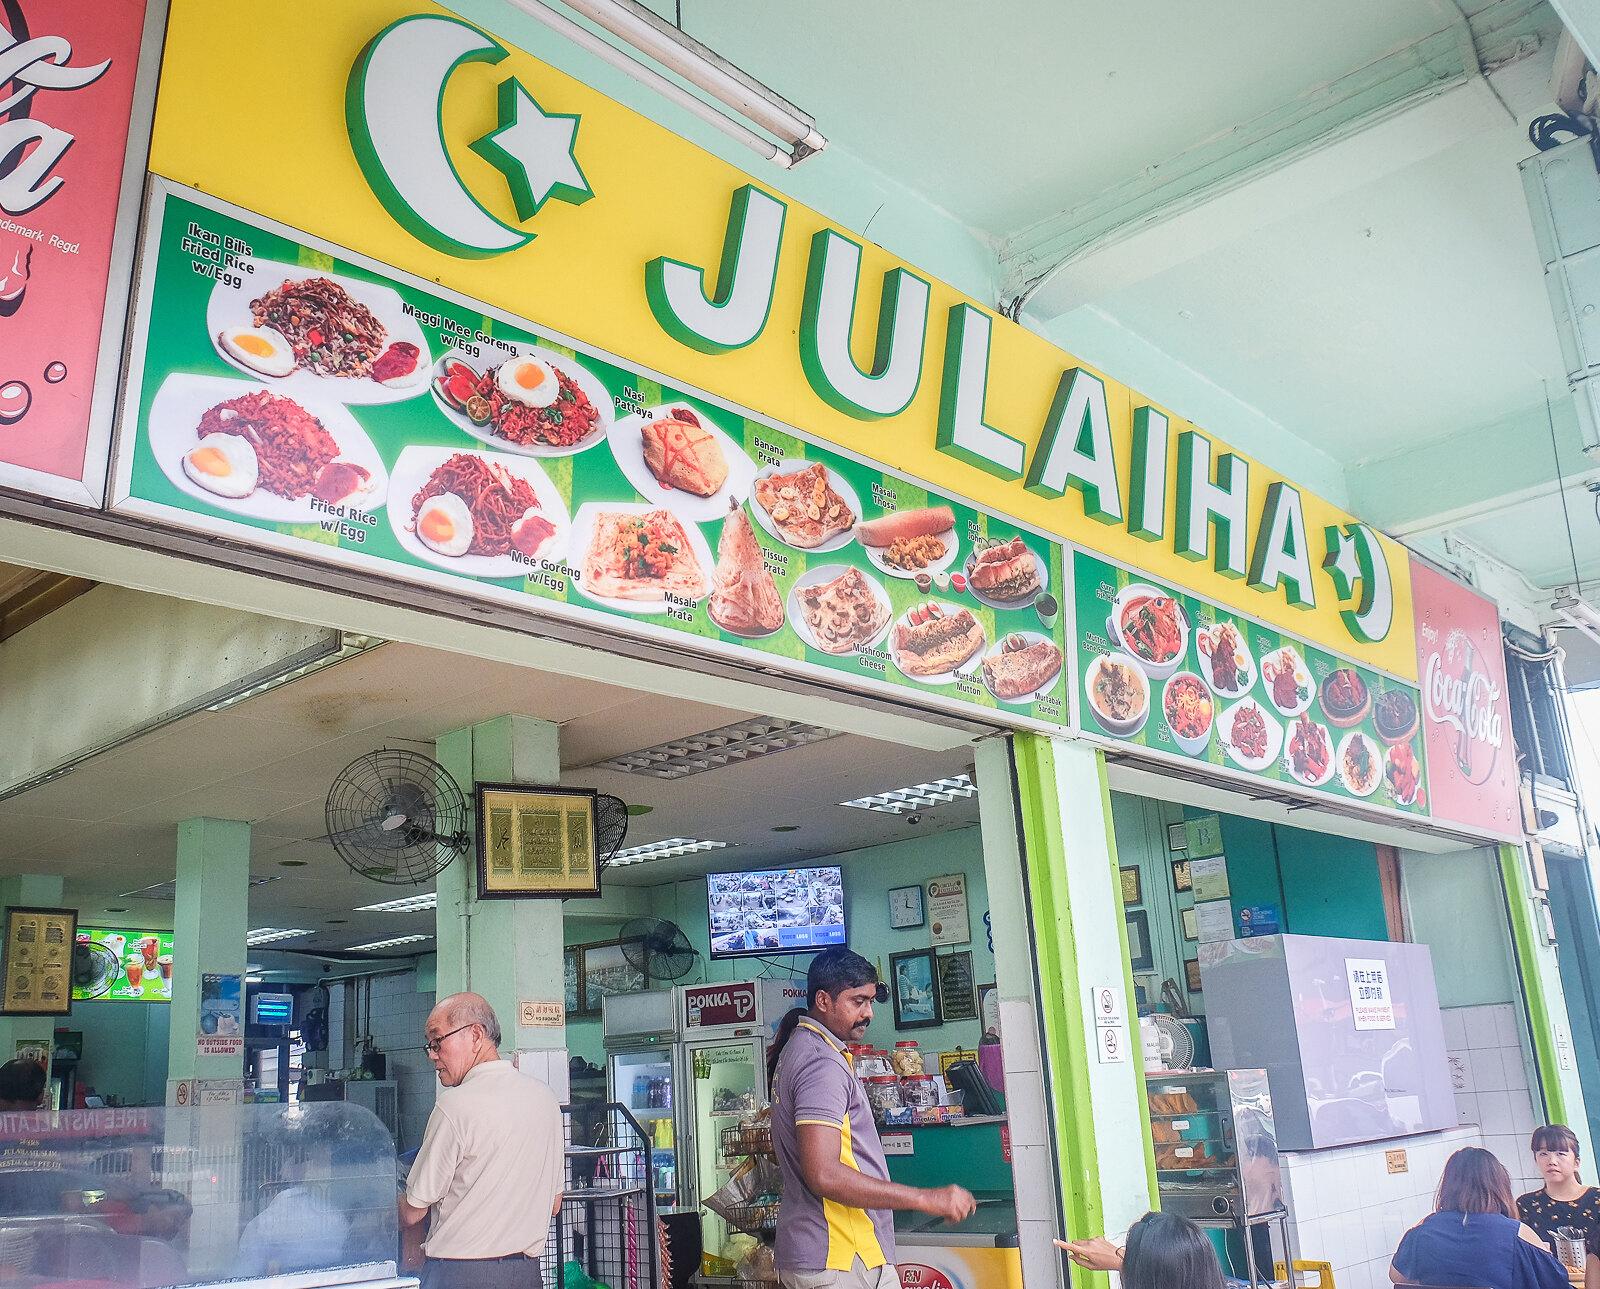 Julaiha Muslim Restaurant - Popular 24/7 Prata Spot for Night Owls - Miss  Tam Chiak